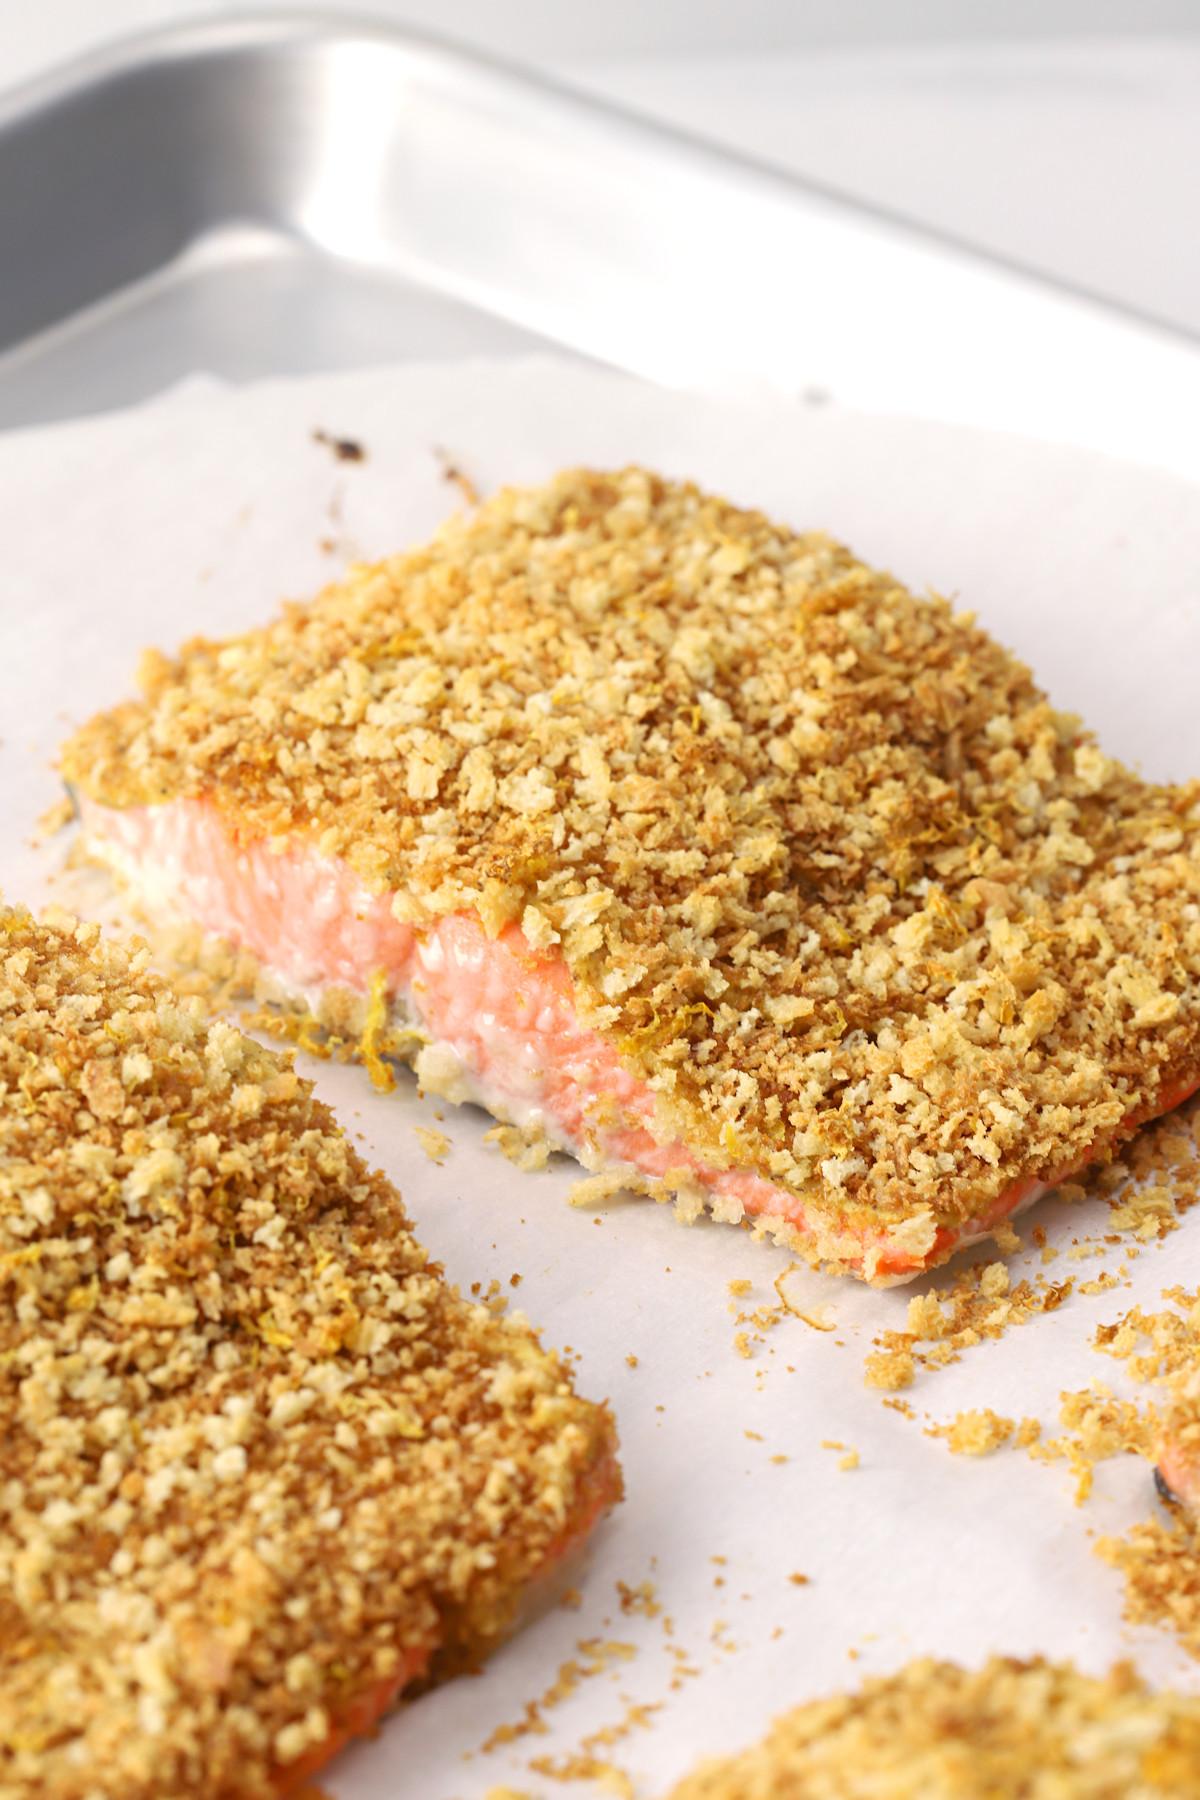 Pieces of panko crusted salmon on a metal sheet pan.